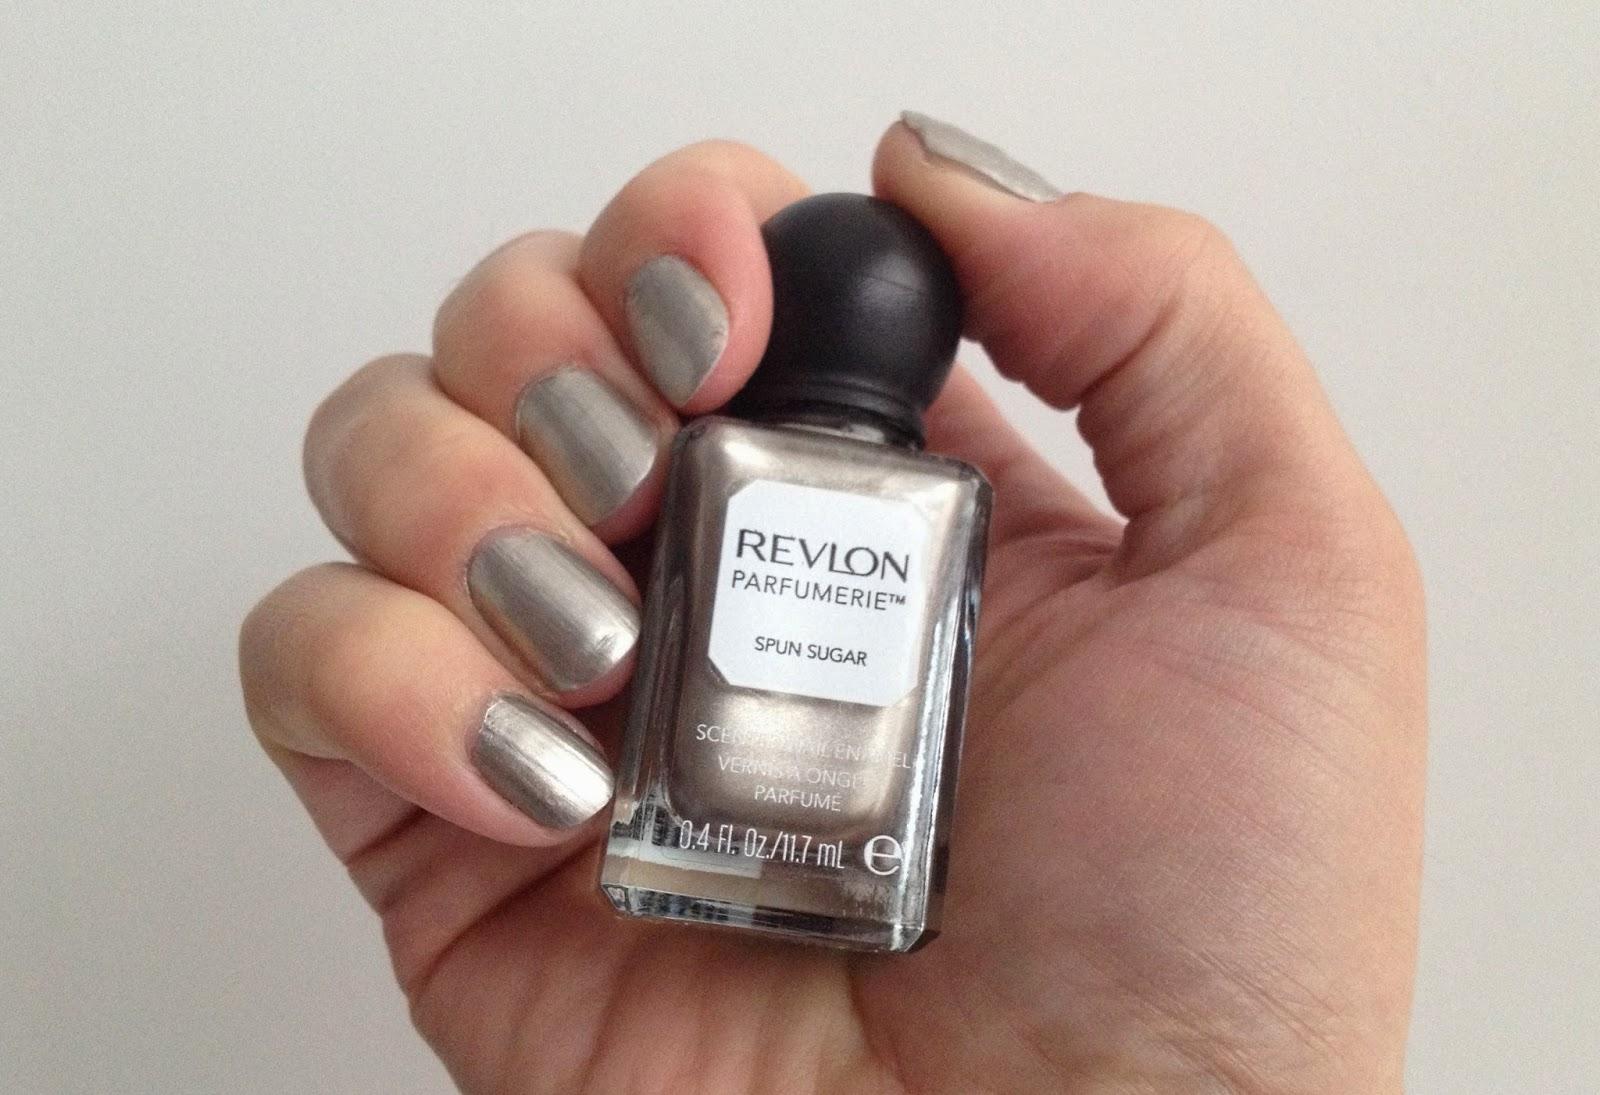 Revlon Parfumerie scented nail polish Spun Sugar